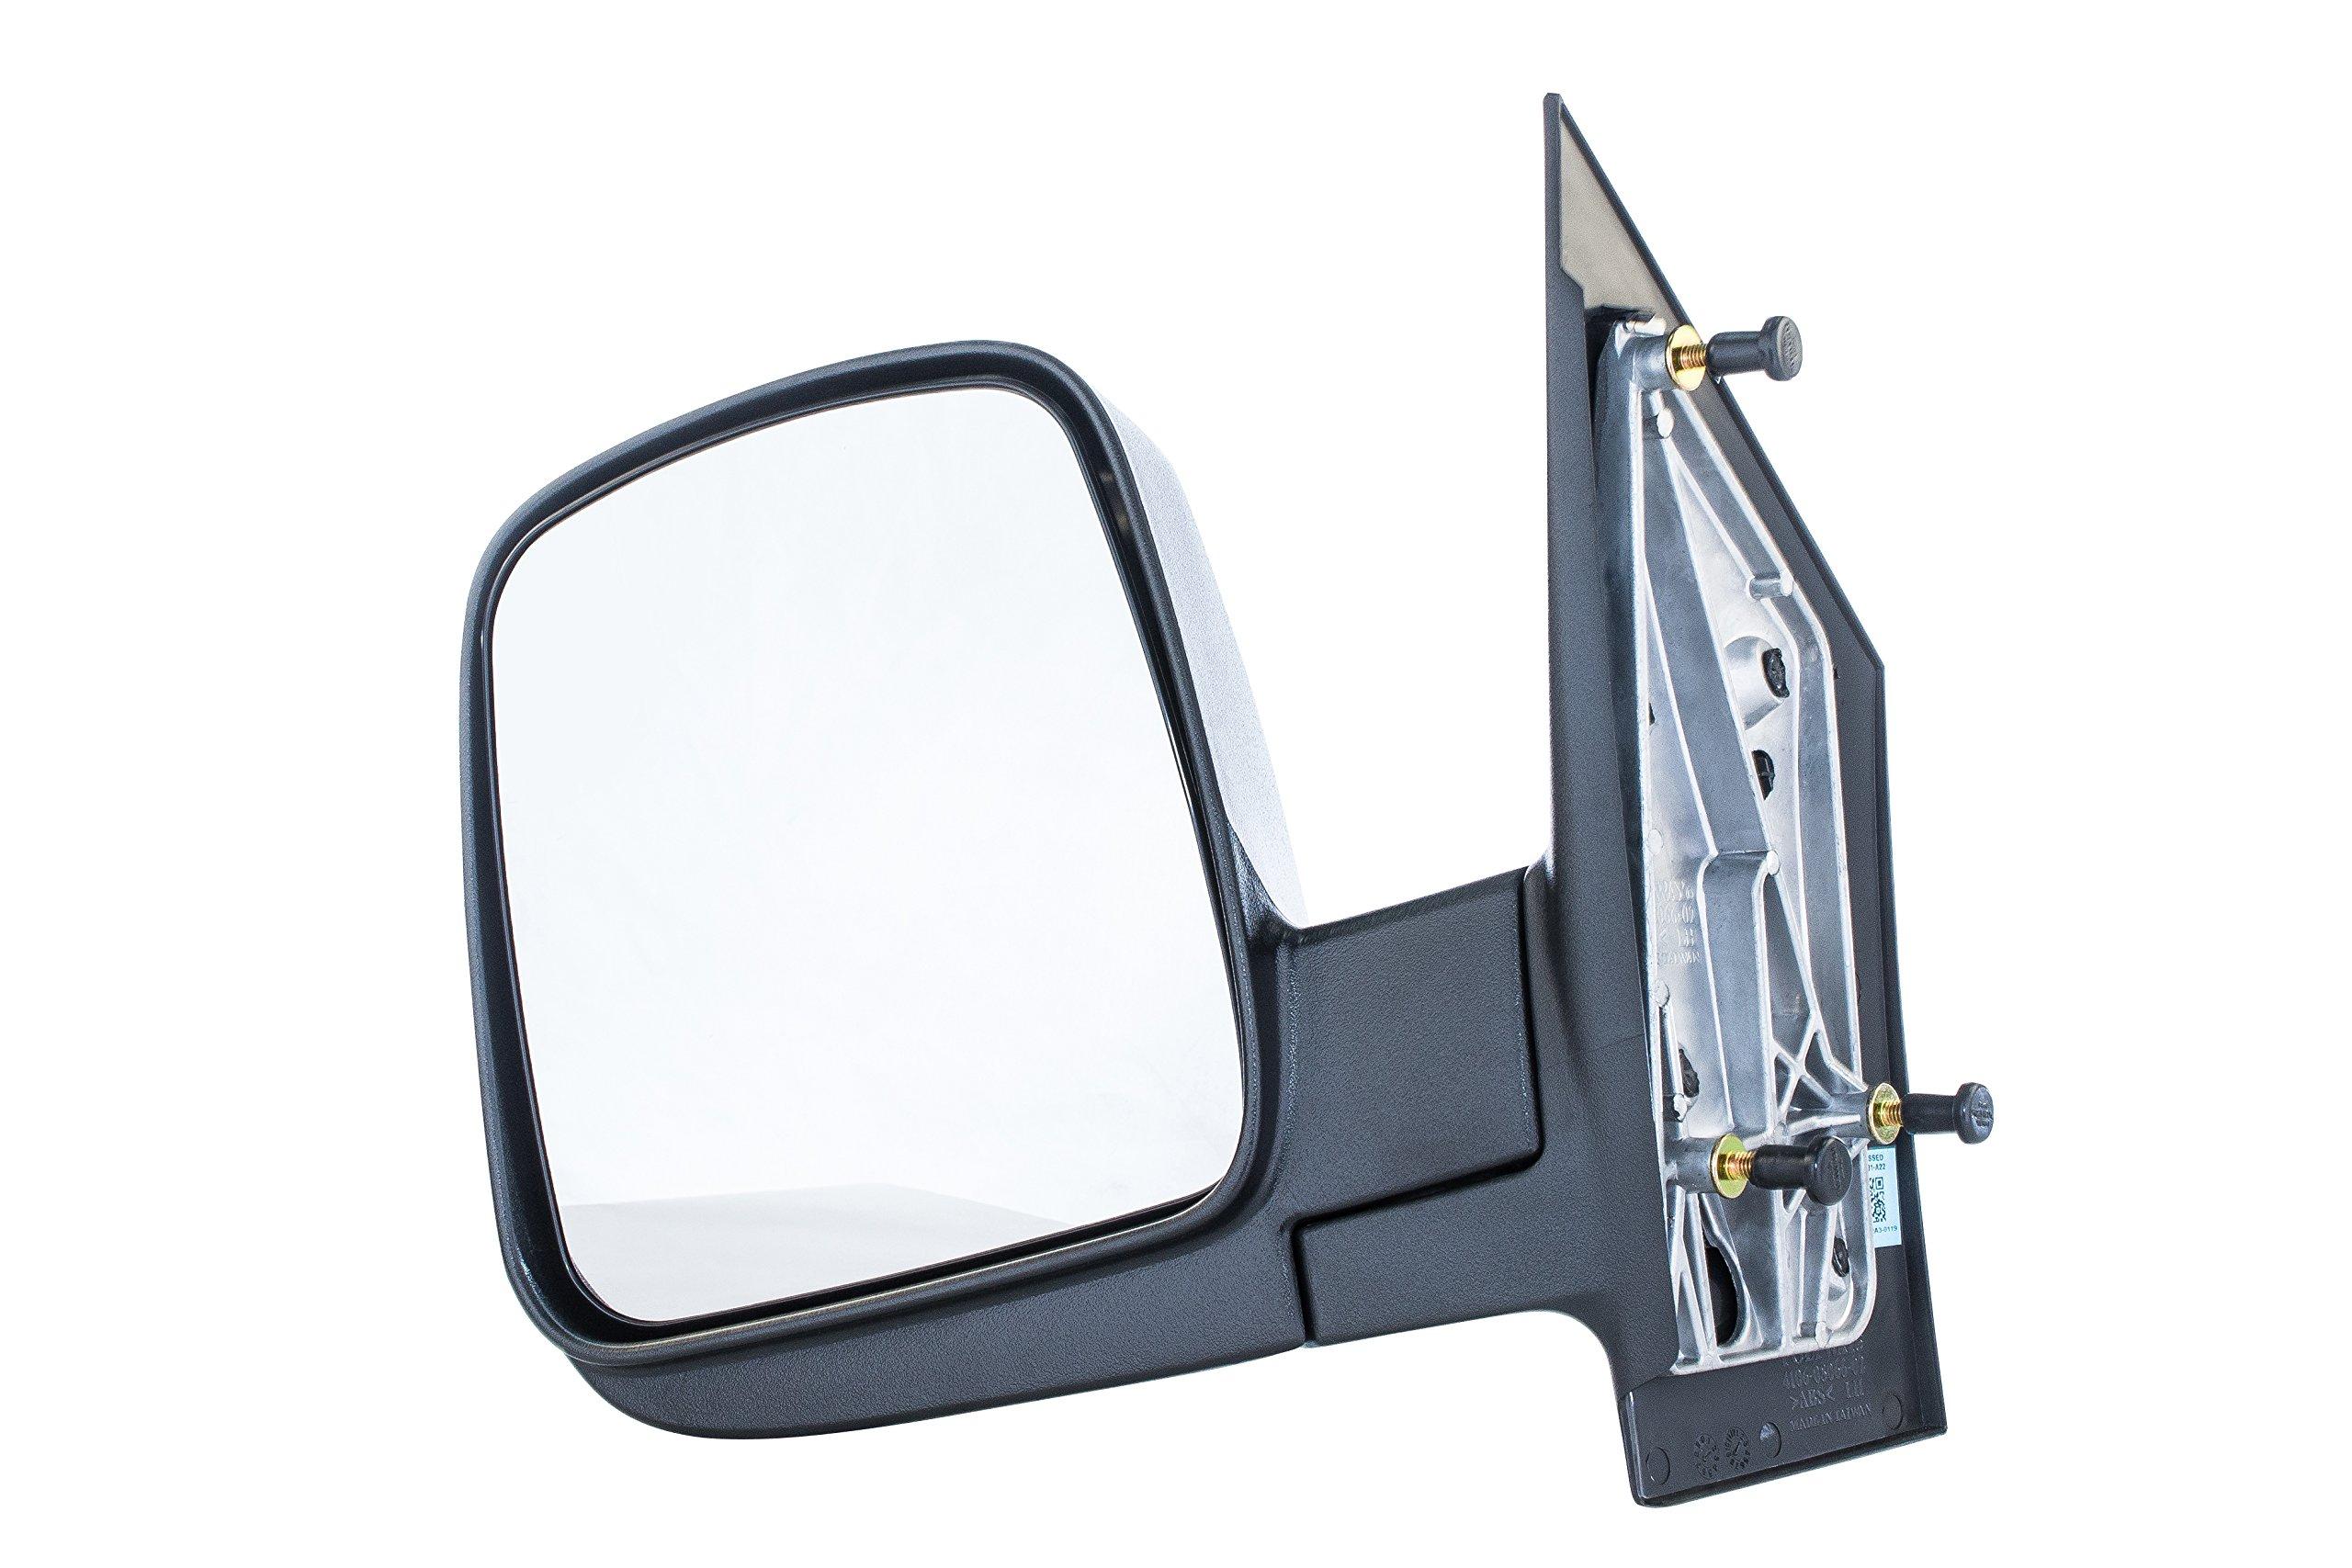 AUTEX Manual Window Crank Handle Driver//Passenger Side Door Handle Compatible with Chevy Express,GMC Savana 1500 2500 3500 95-15 81576